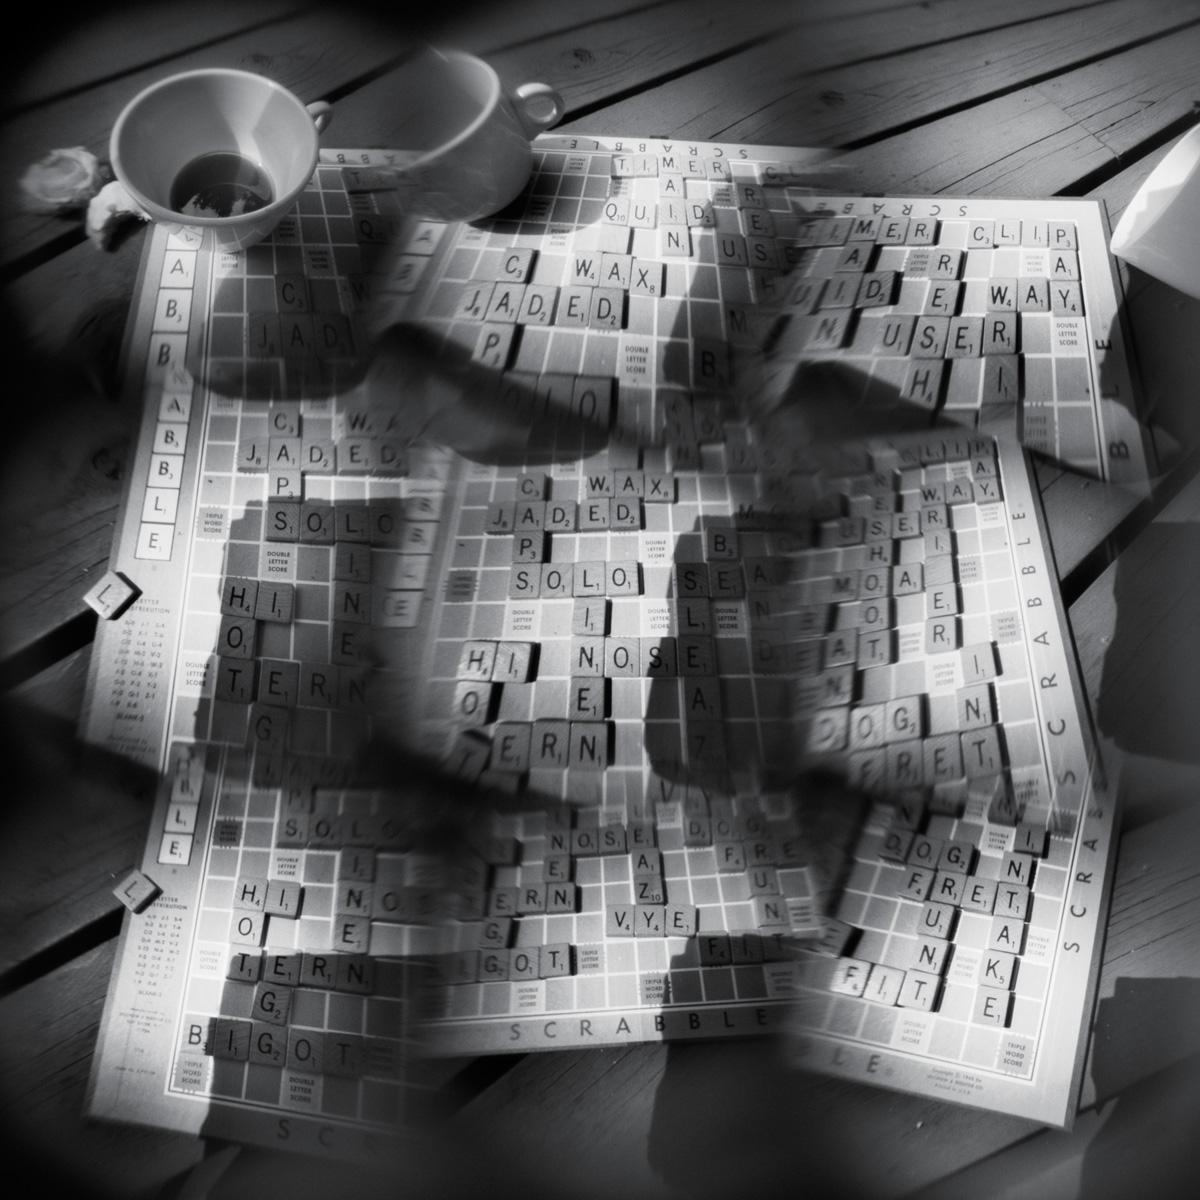 Scrabble - pinhole camera photograph